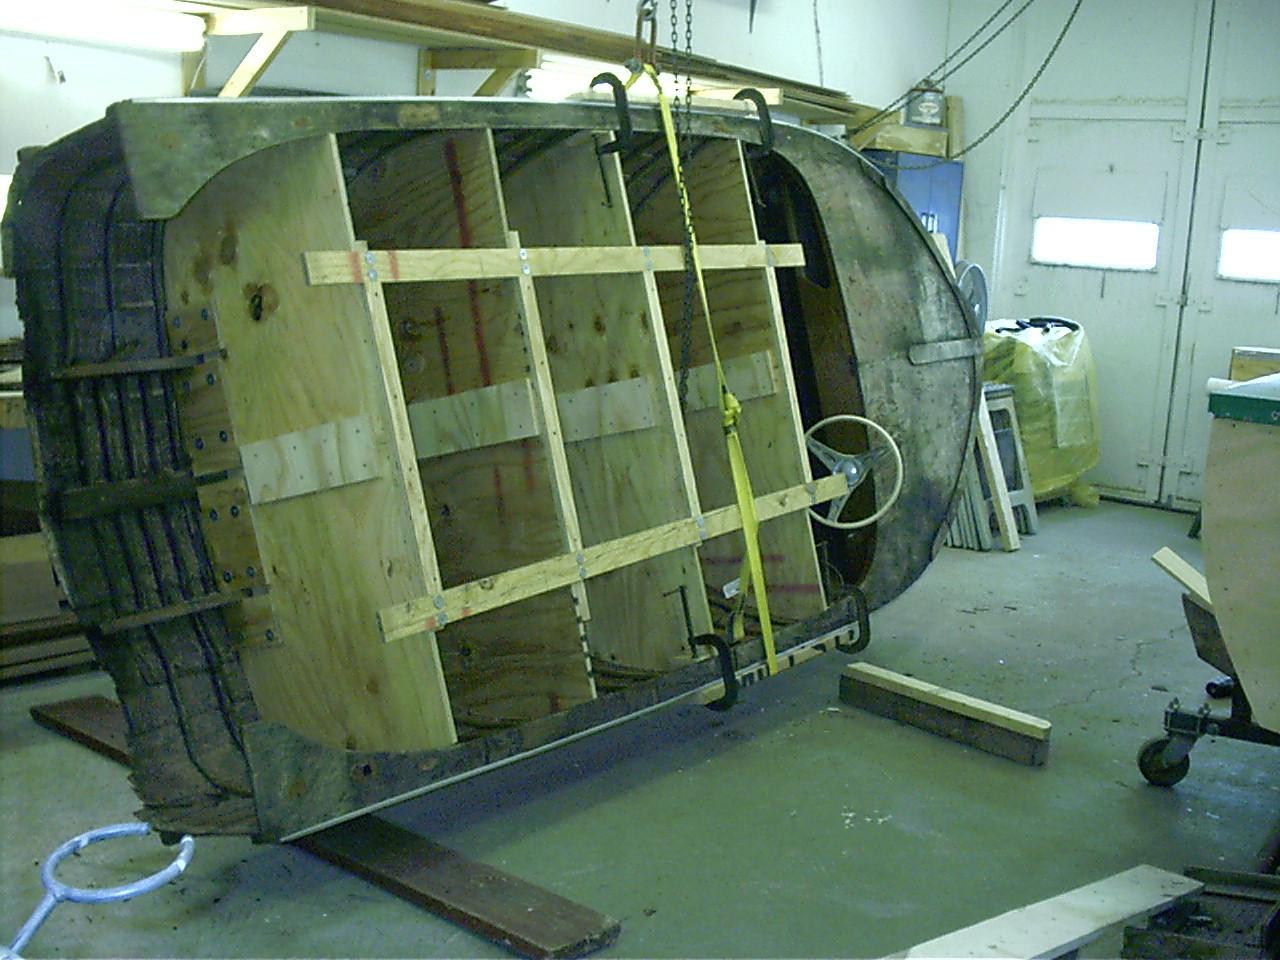 Turning hull upside down.